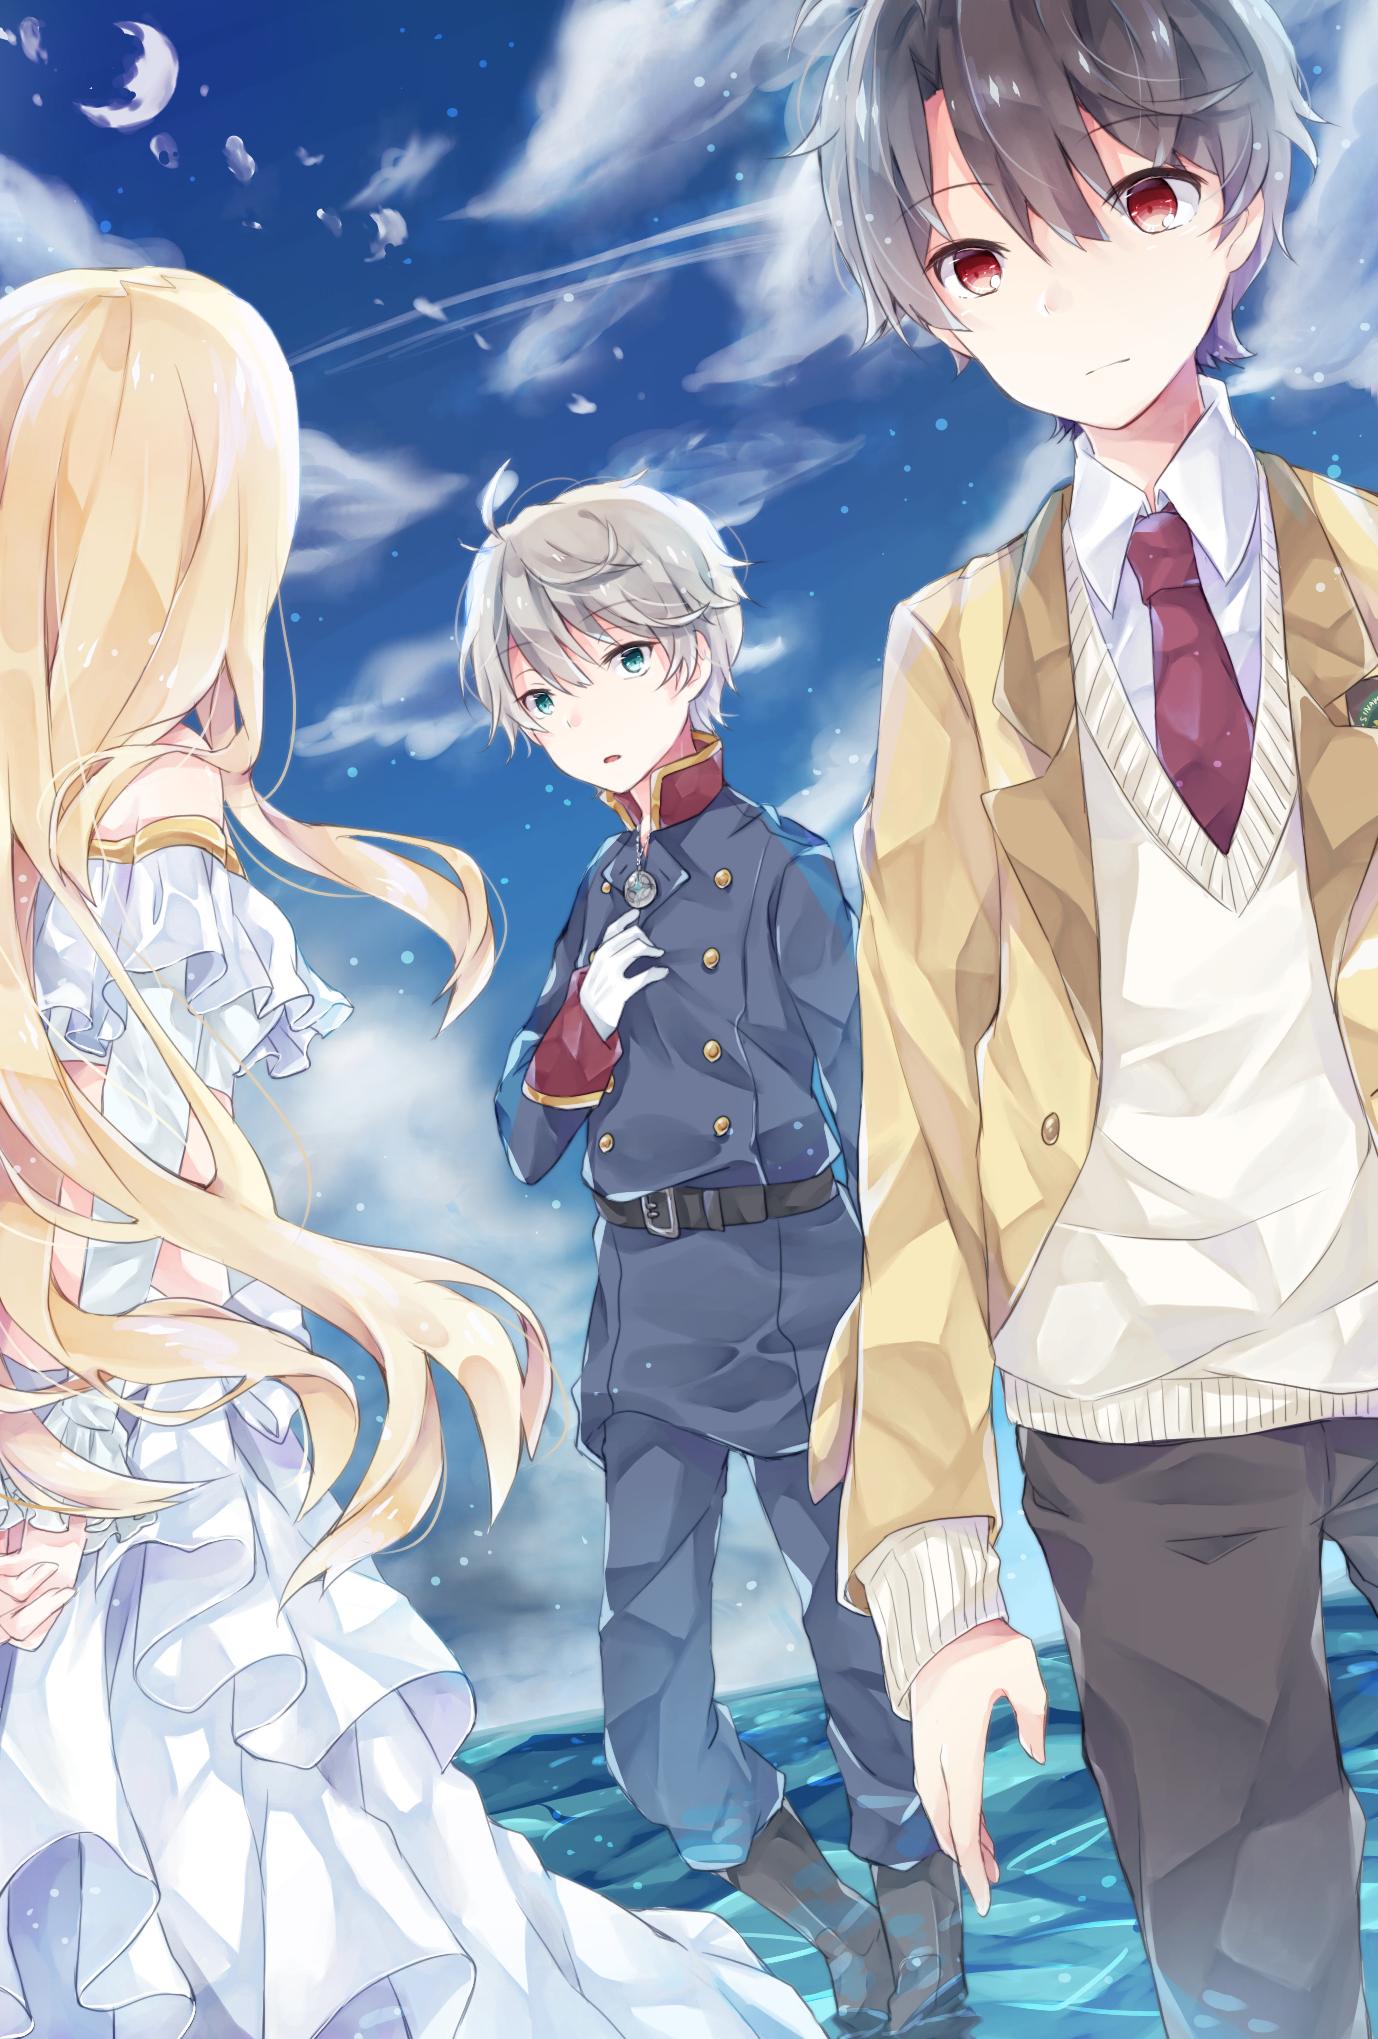 anime_wallpaper_ALDNOAH_ZERO_7250838-47498113_p0.jpg